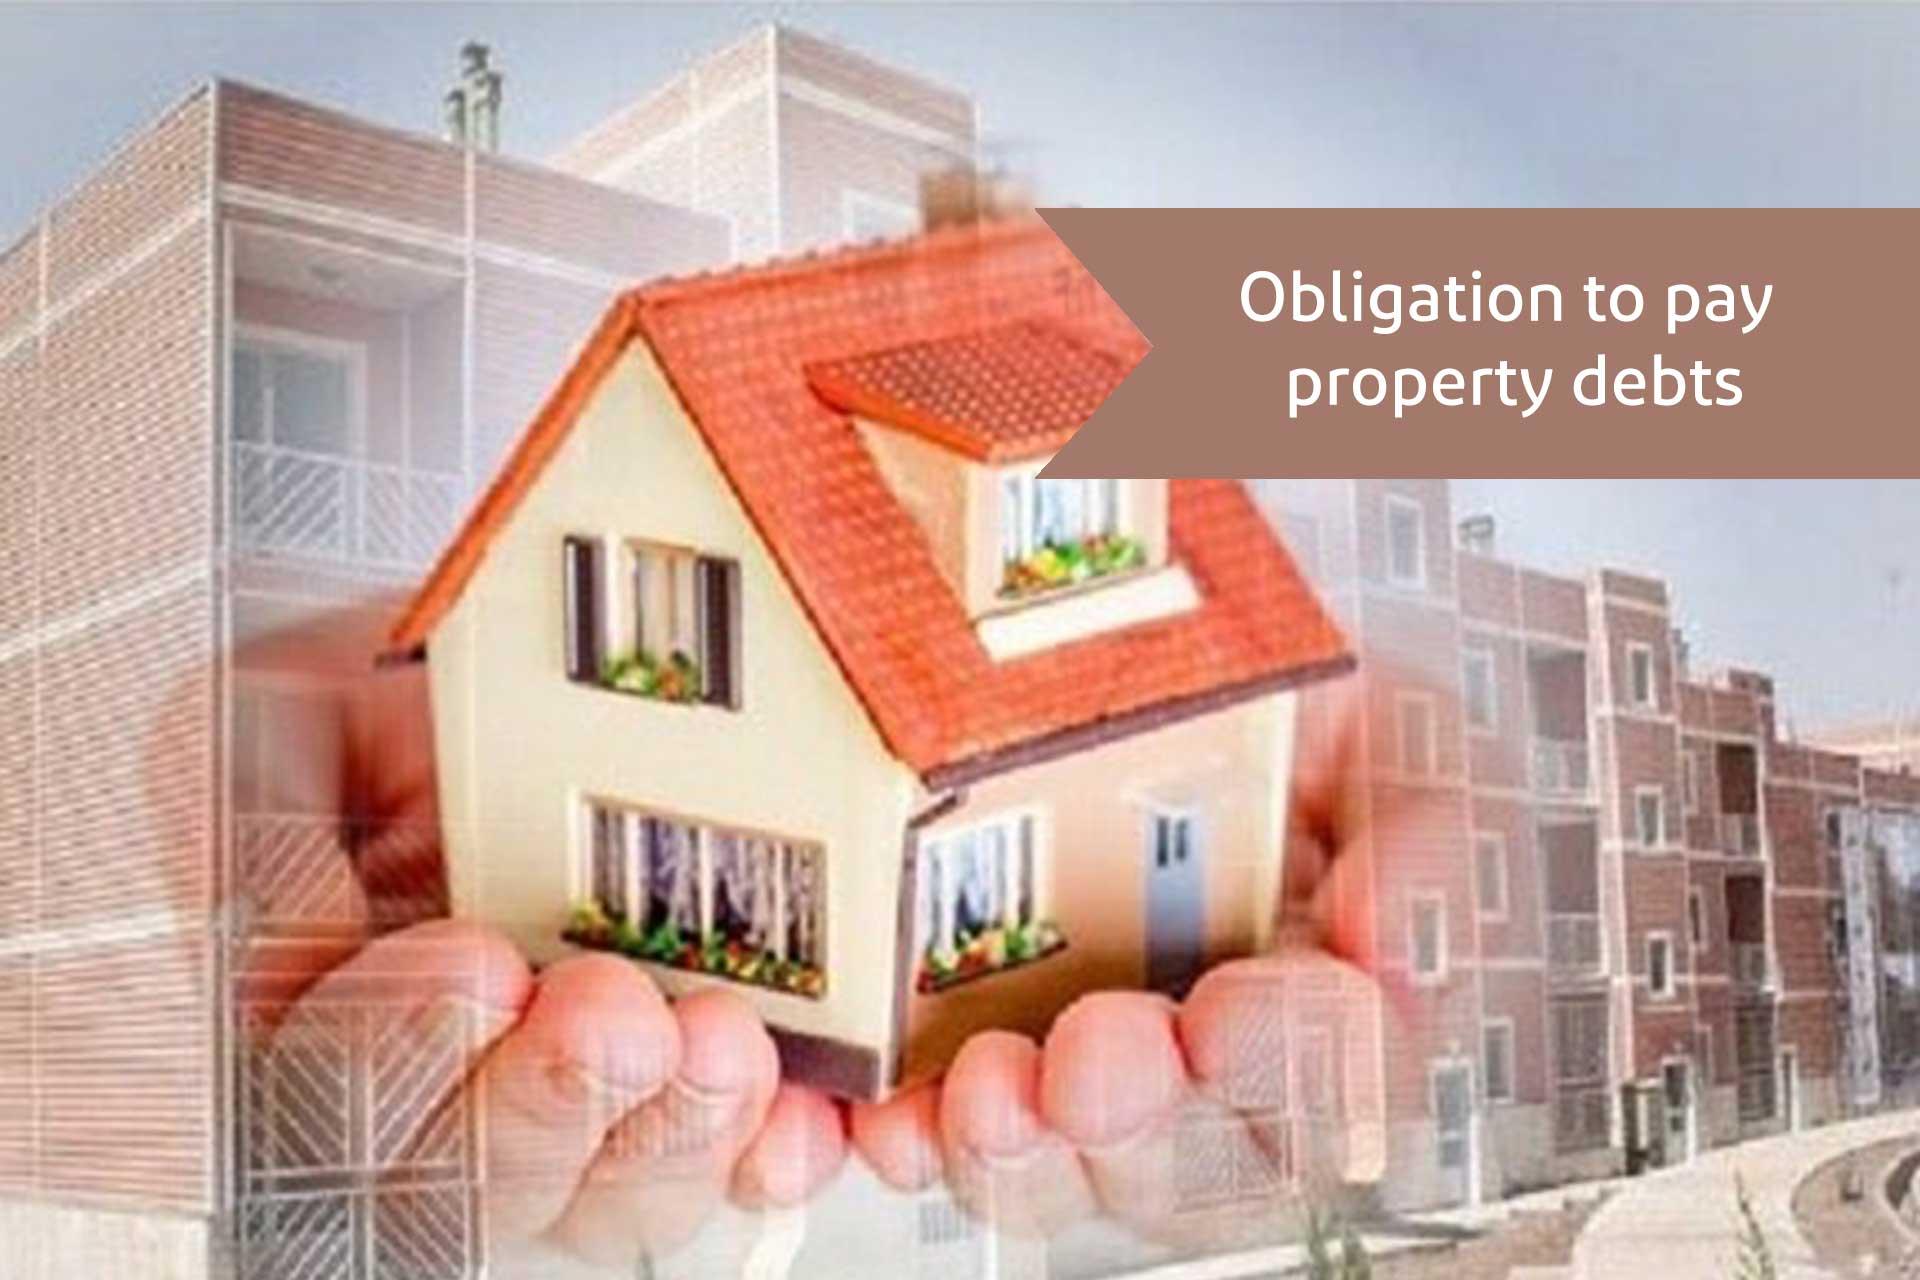 Obligation to pay property debts-alemohamad